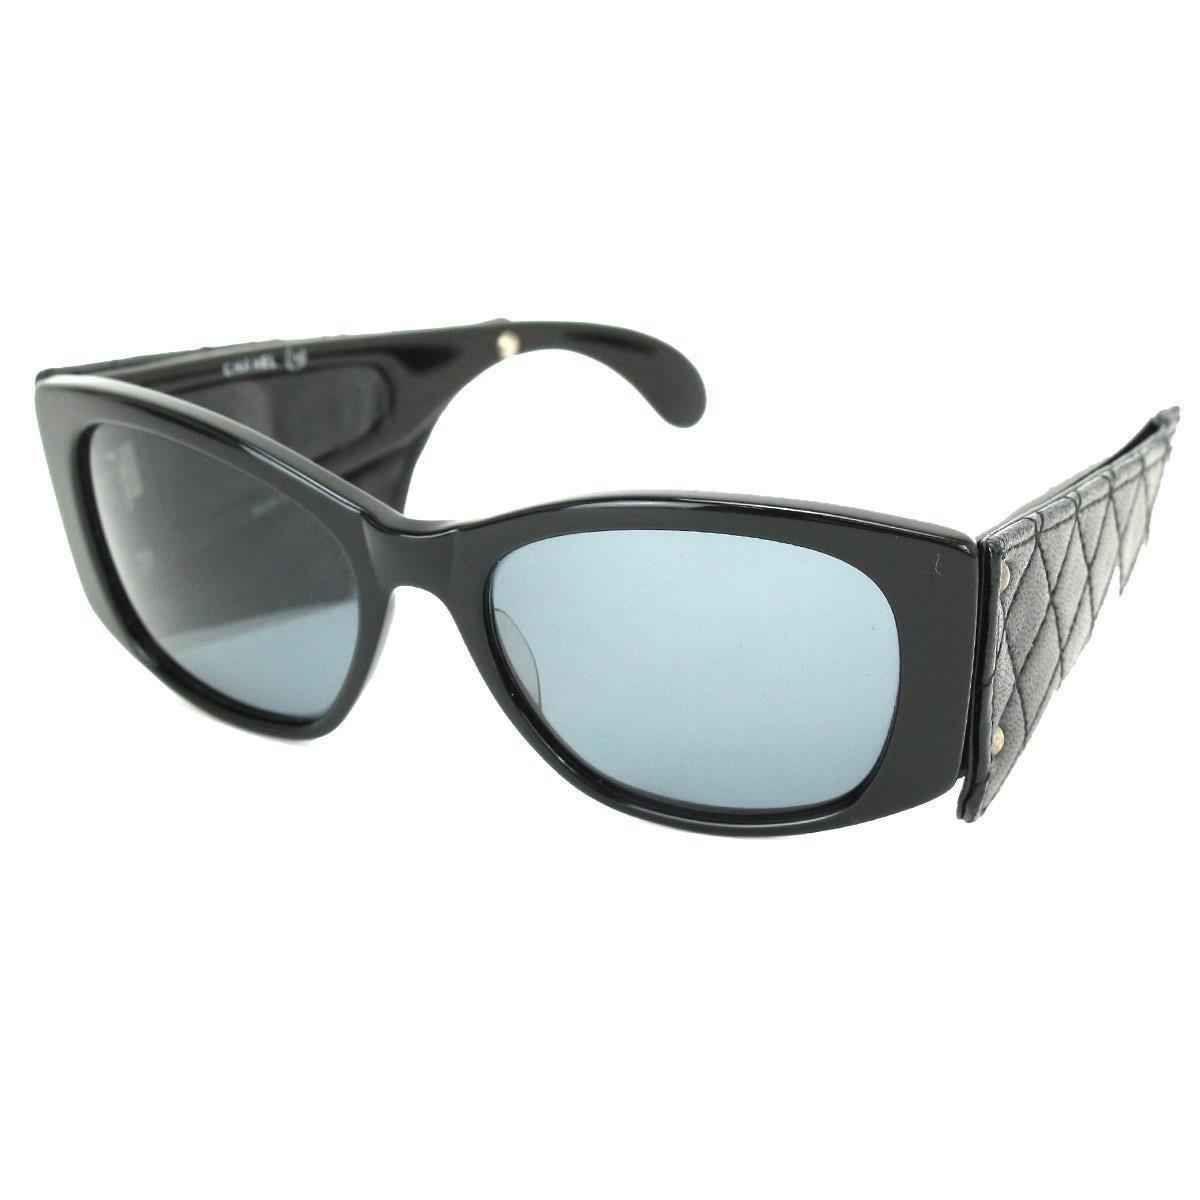 9b1be51cf107 Chanel Matelasse Butterfly Sunglasses - Restaurant and Palinka Bar